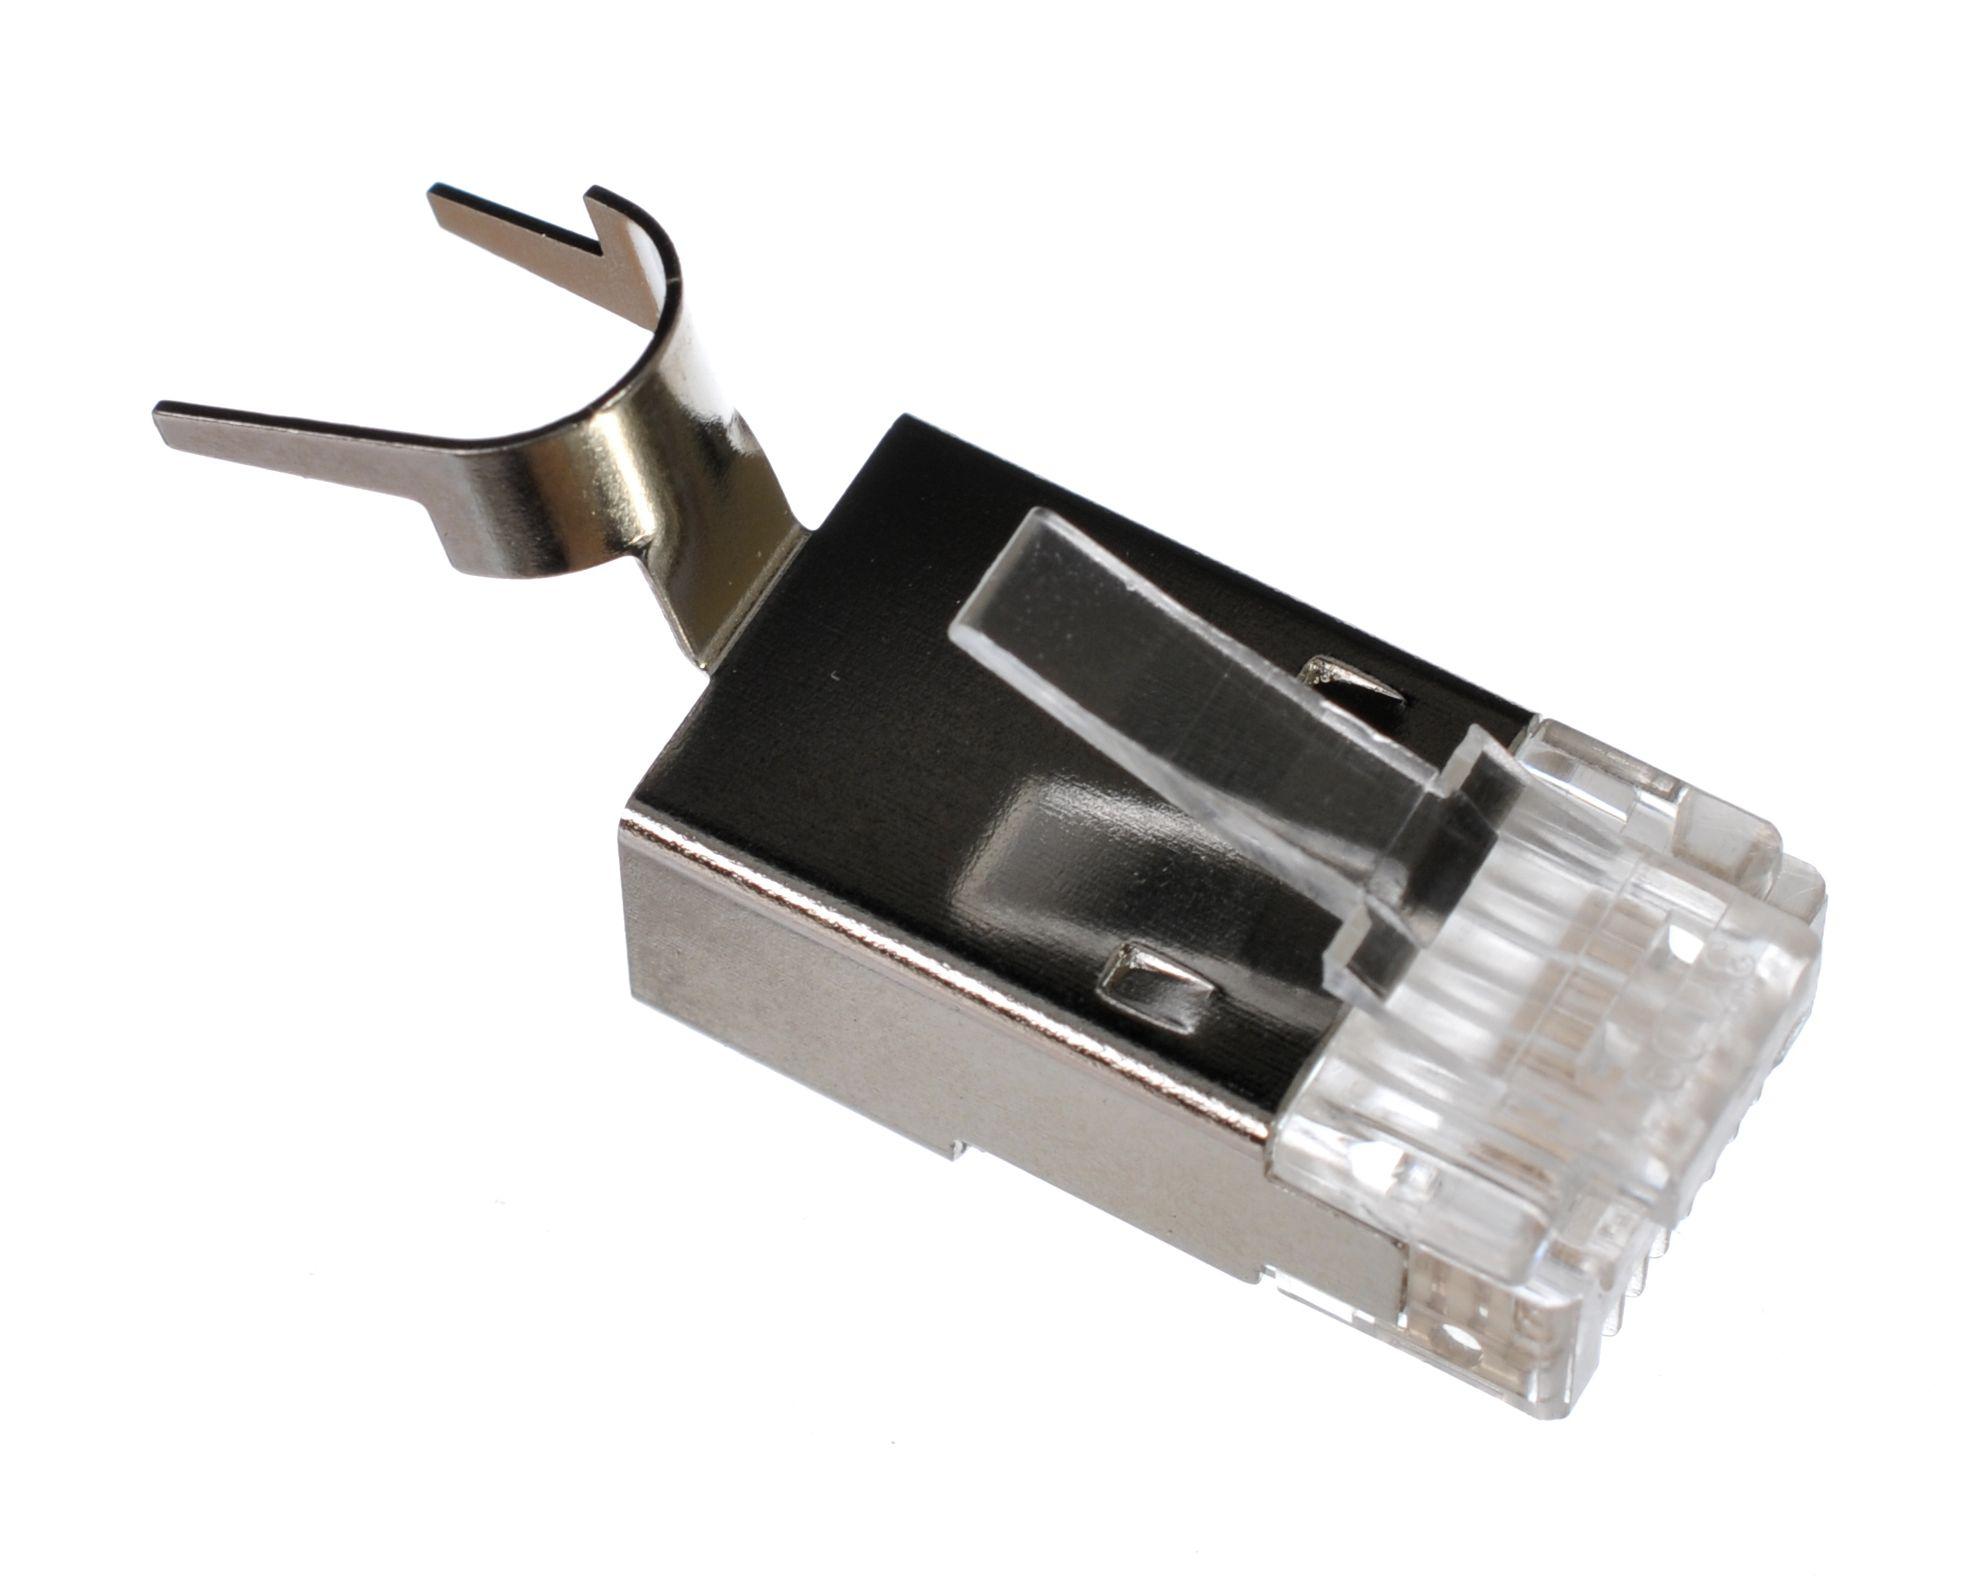 8P8C RJ45 Modular Shielded Plug | Premium for Large O.D. Cable